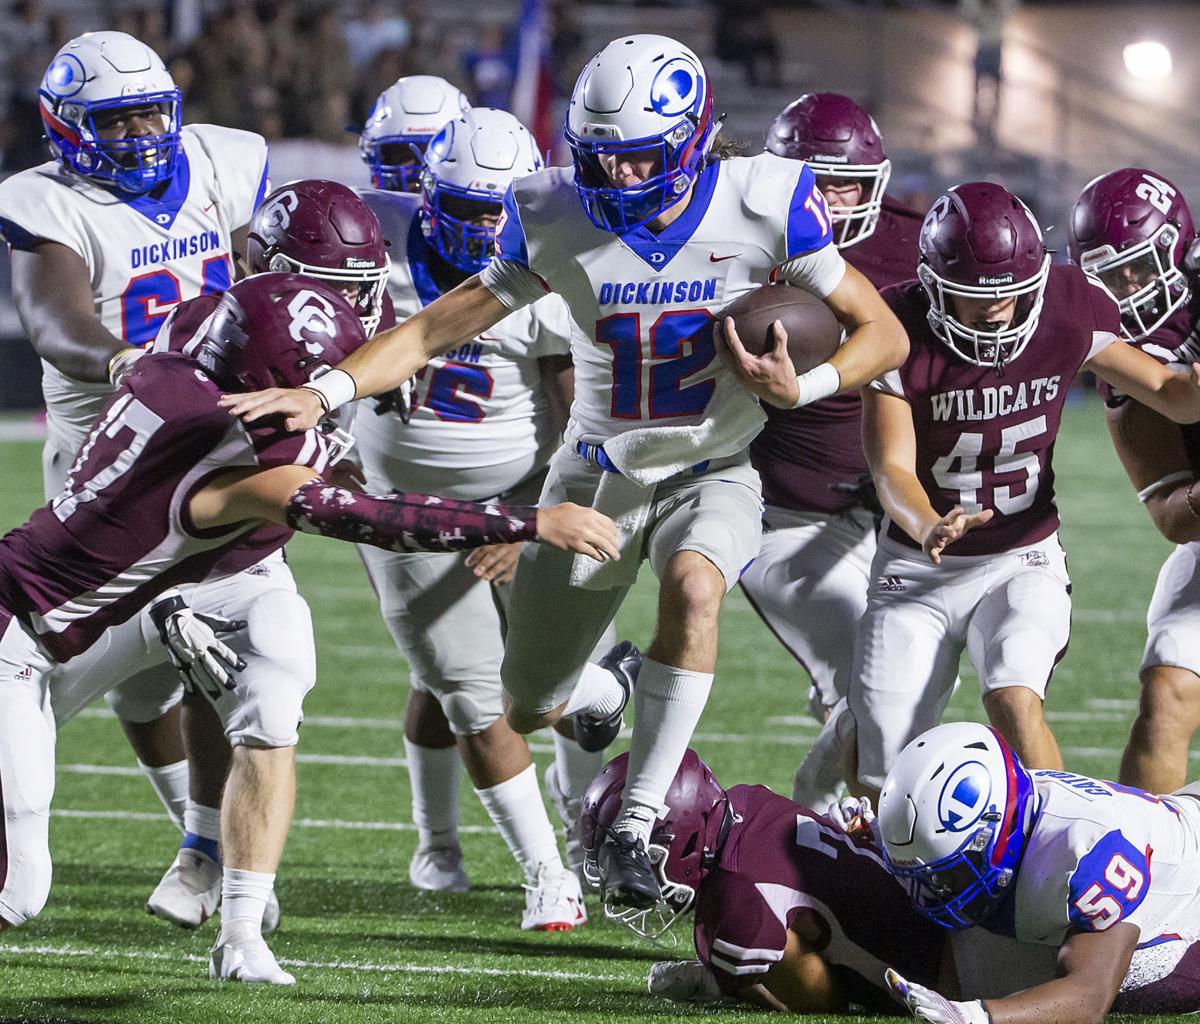 Clear Creek vs Dickinson High School Football